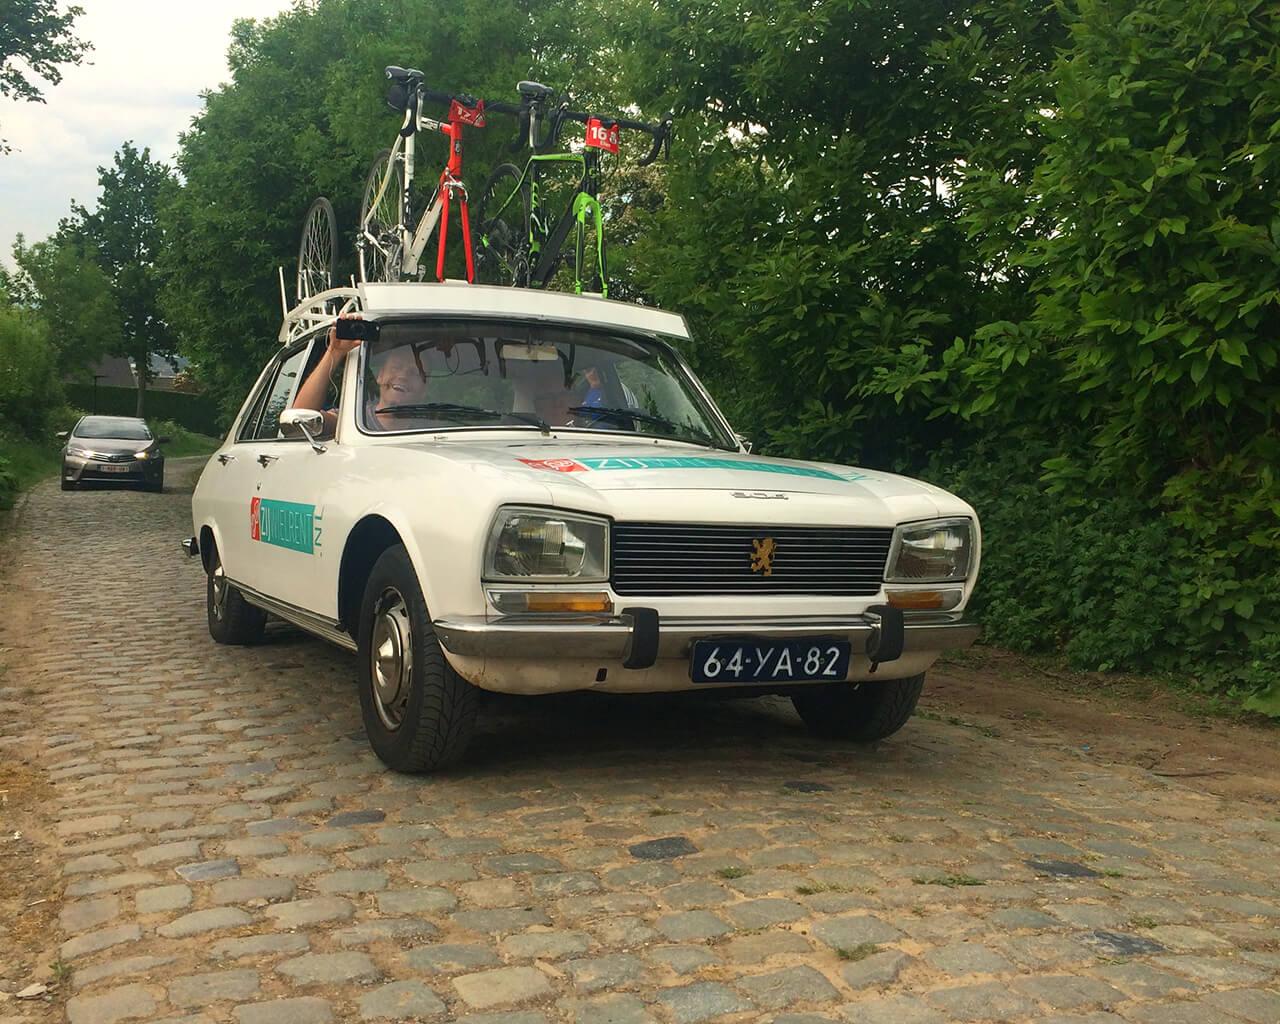 Oldtimer Peugeot in Vlaanderen